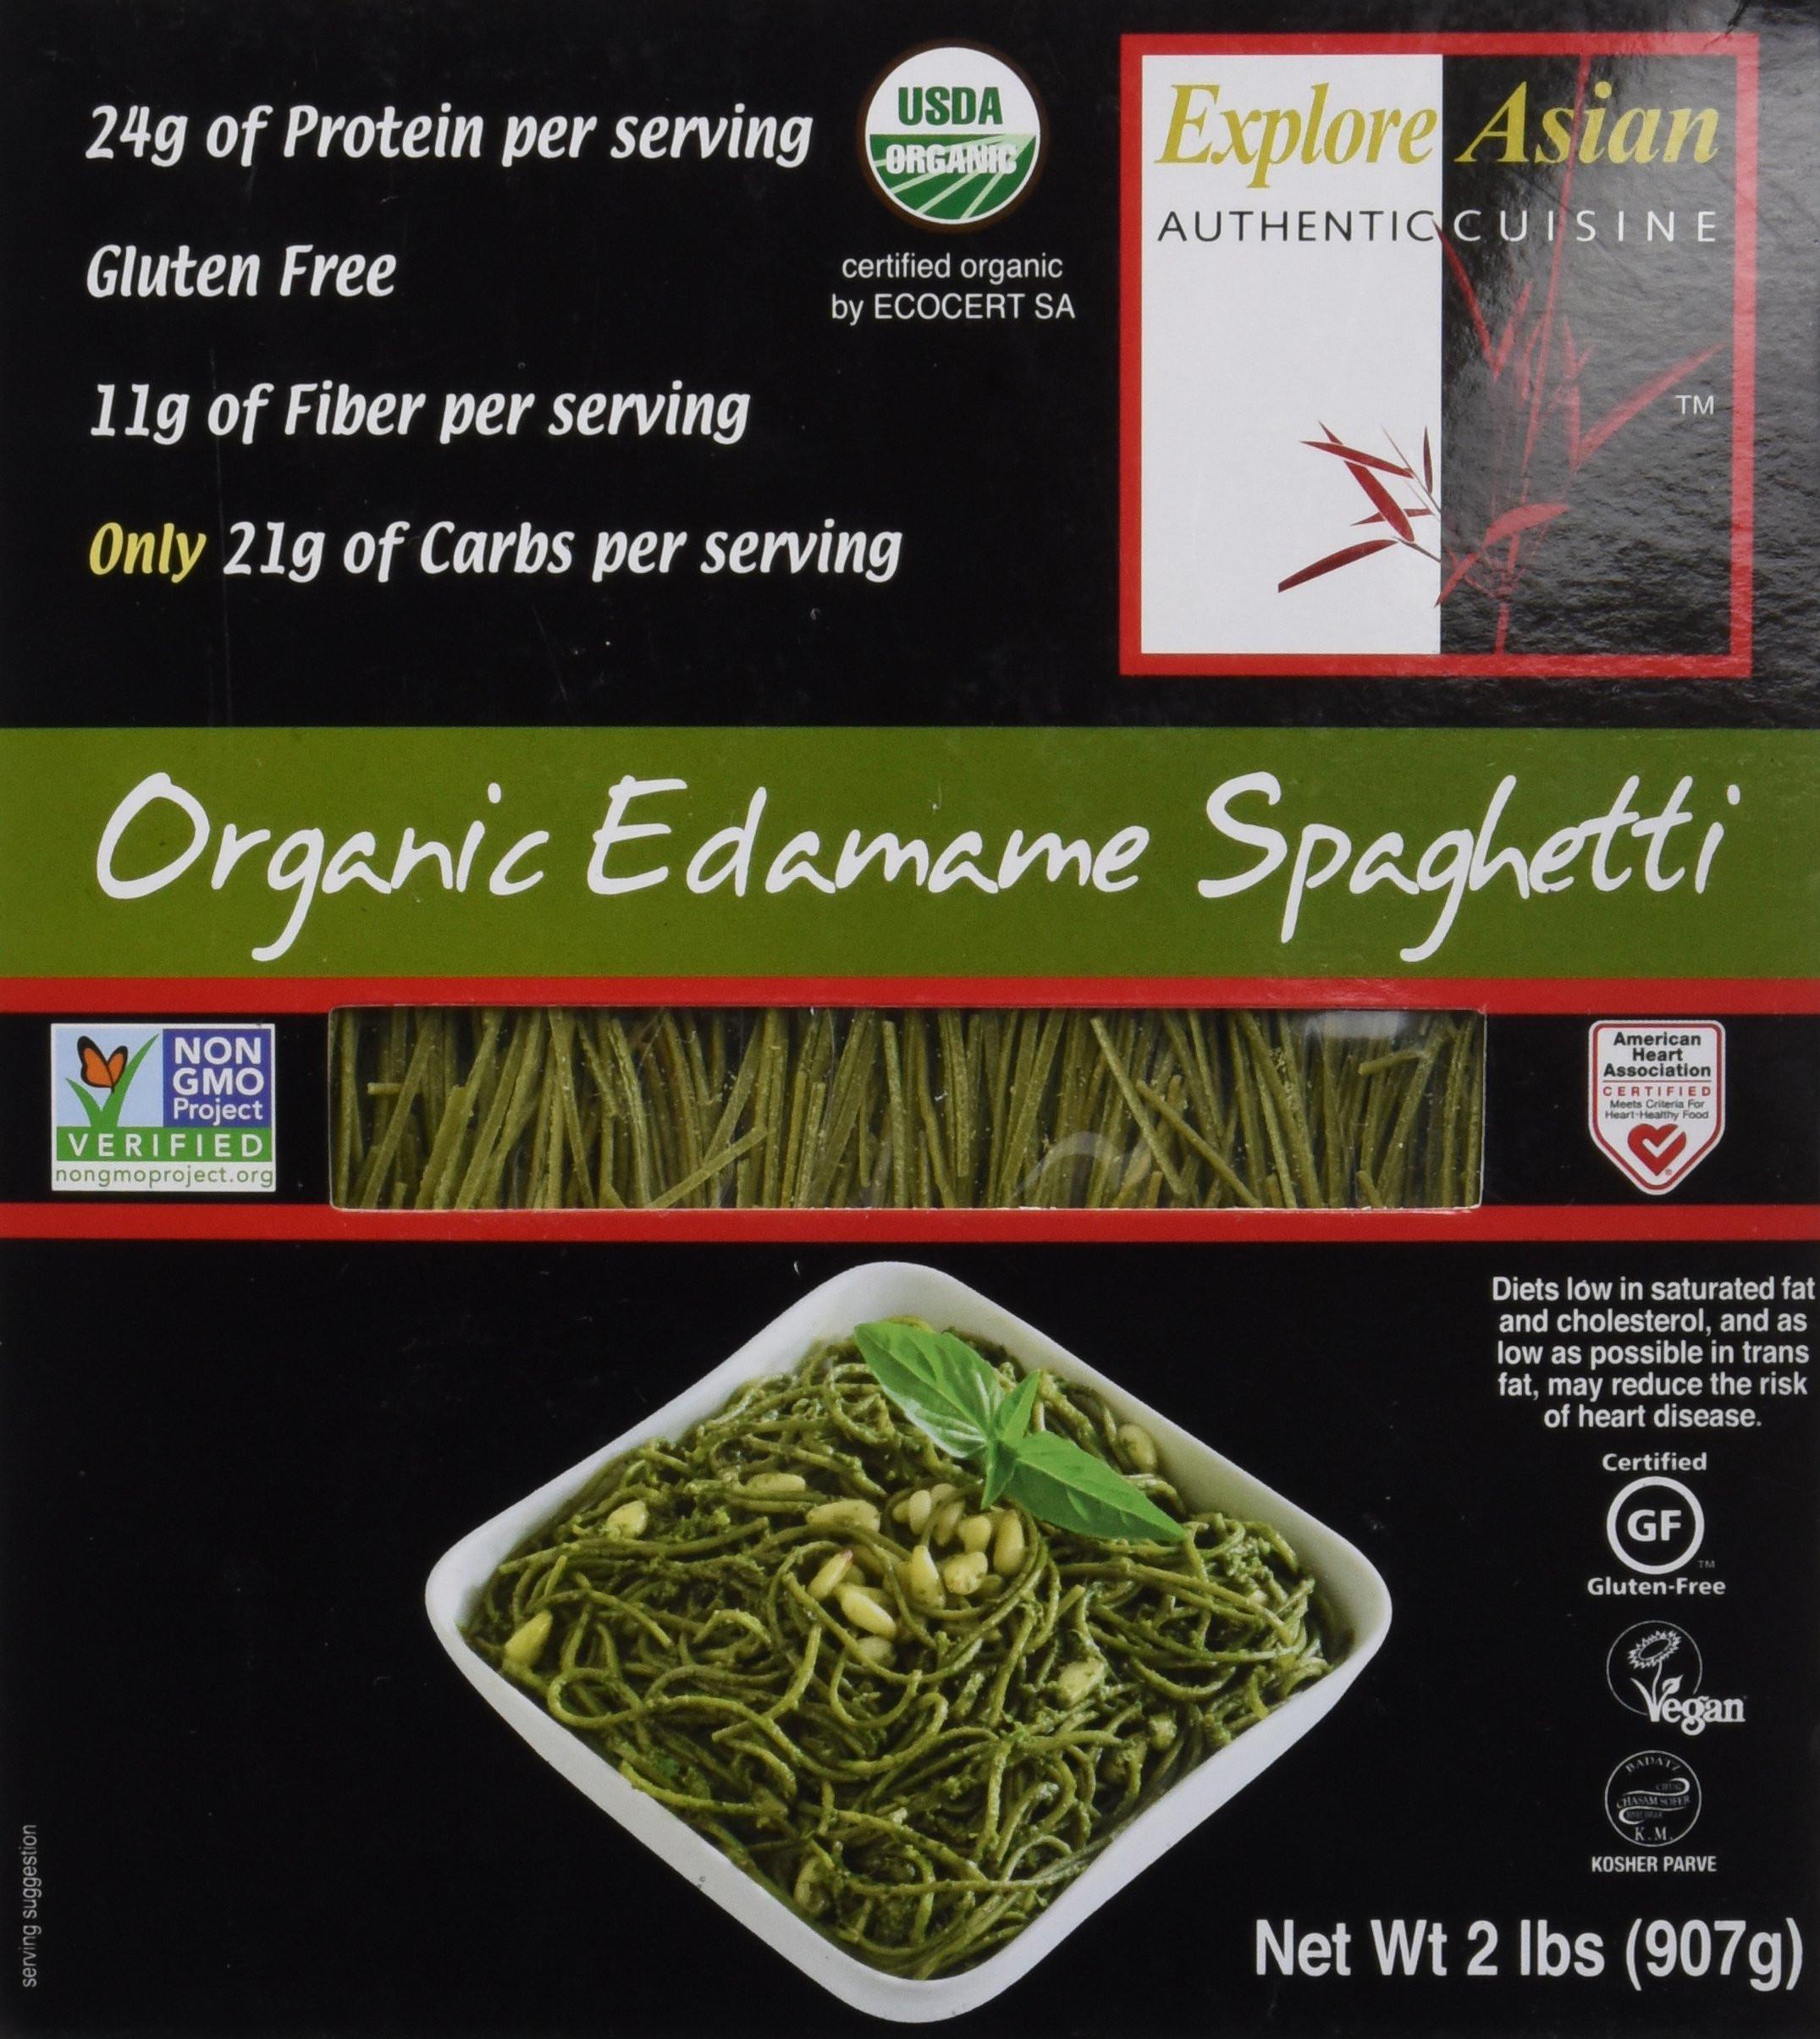 Organic Edamame Spaghetti  2 pound box 18 servings Gluten free vegan kosher